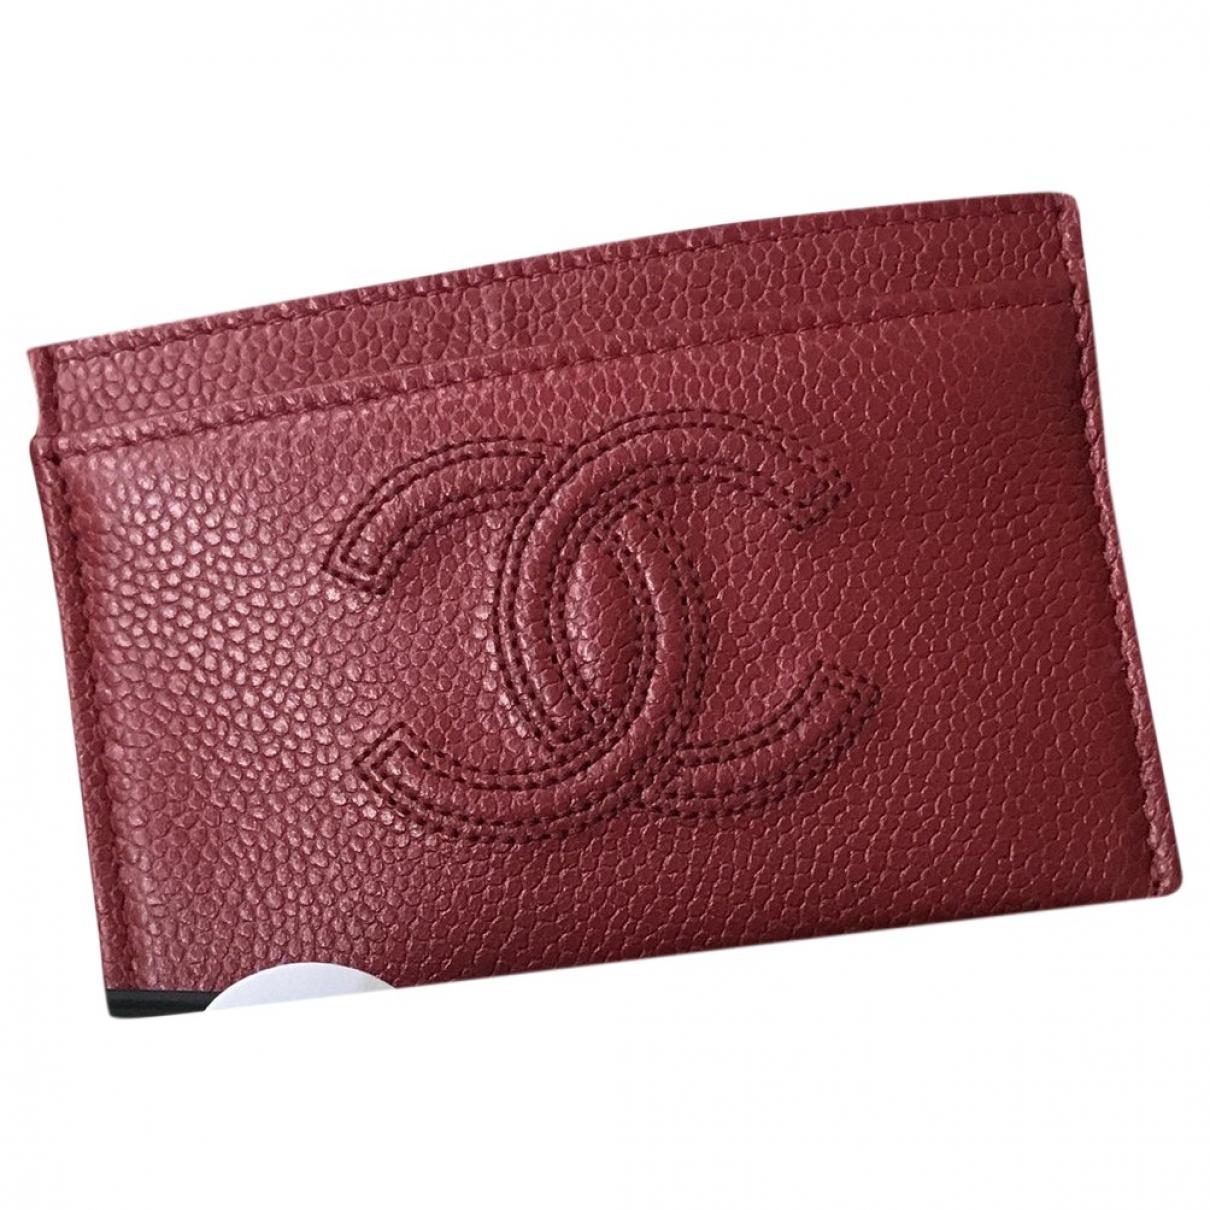 Chanel \N Kleinlederwaren in  Rot Exotenleder